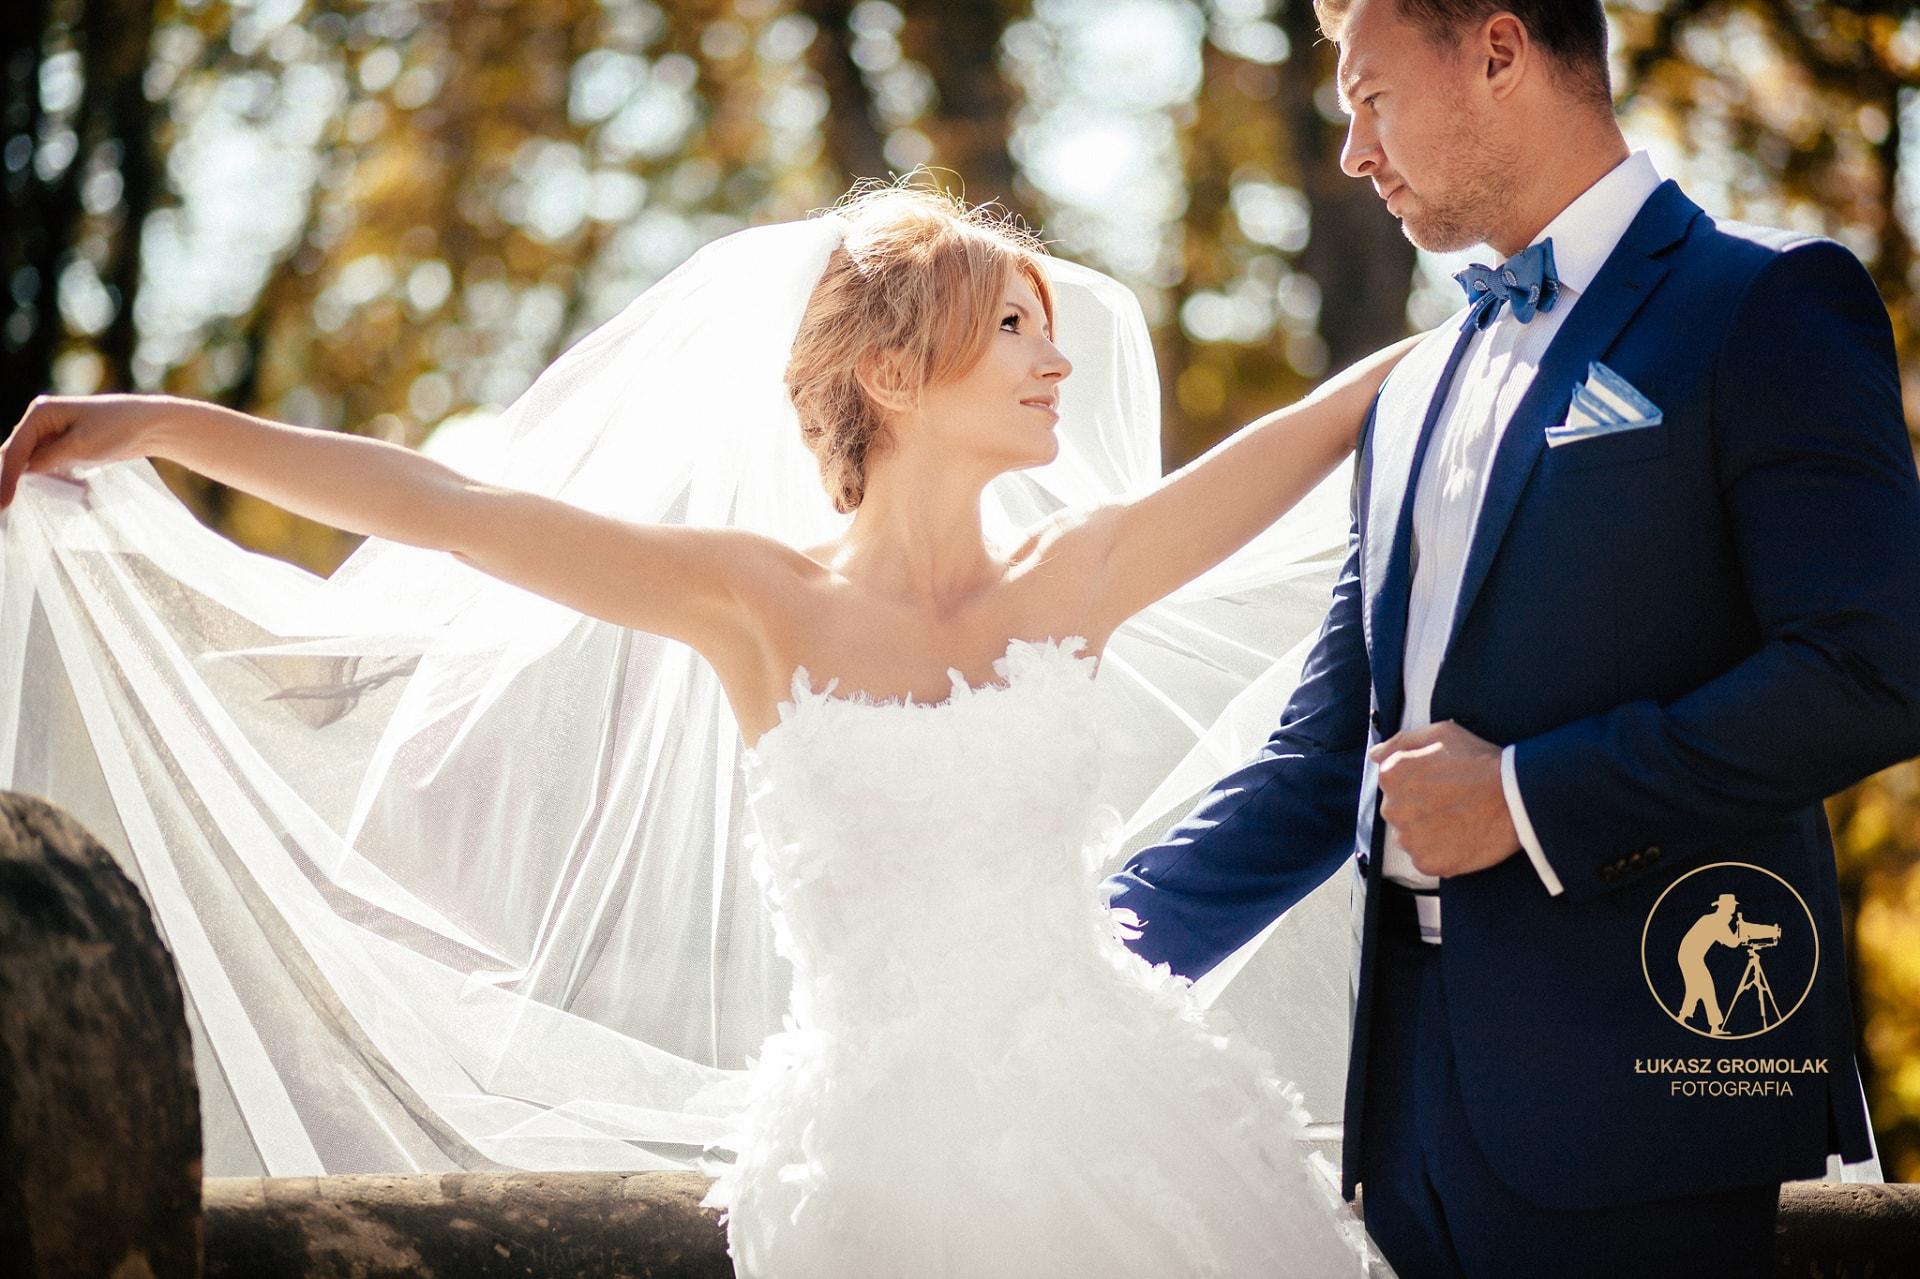 Fryzury ślubne Pod Welon Planujemywesele